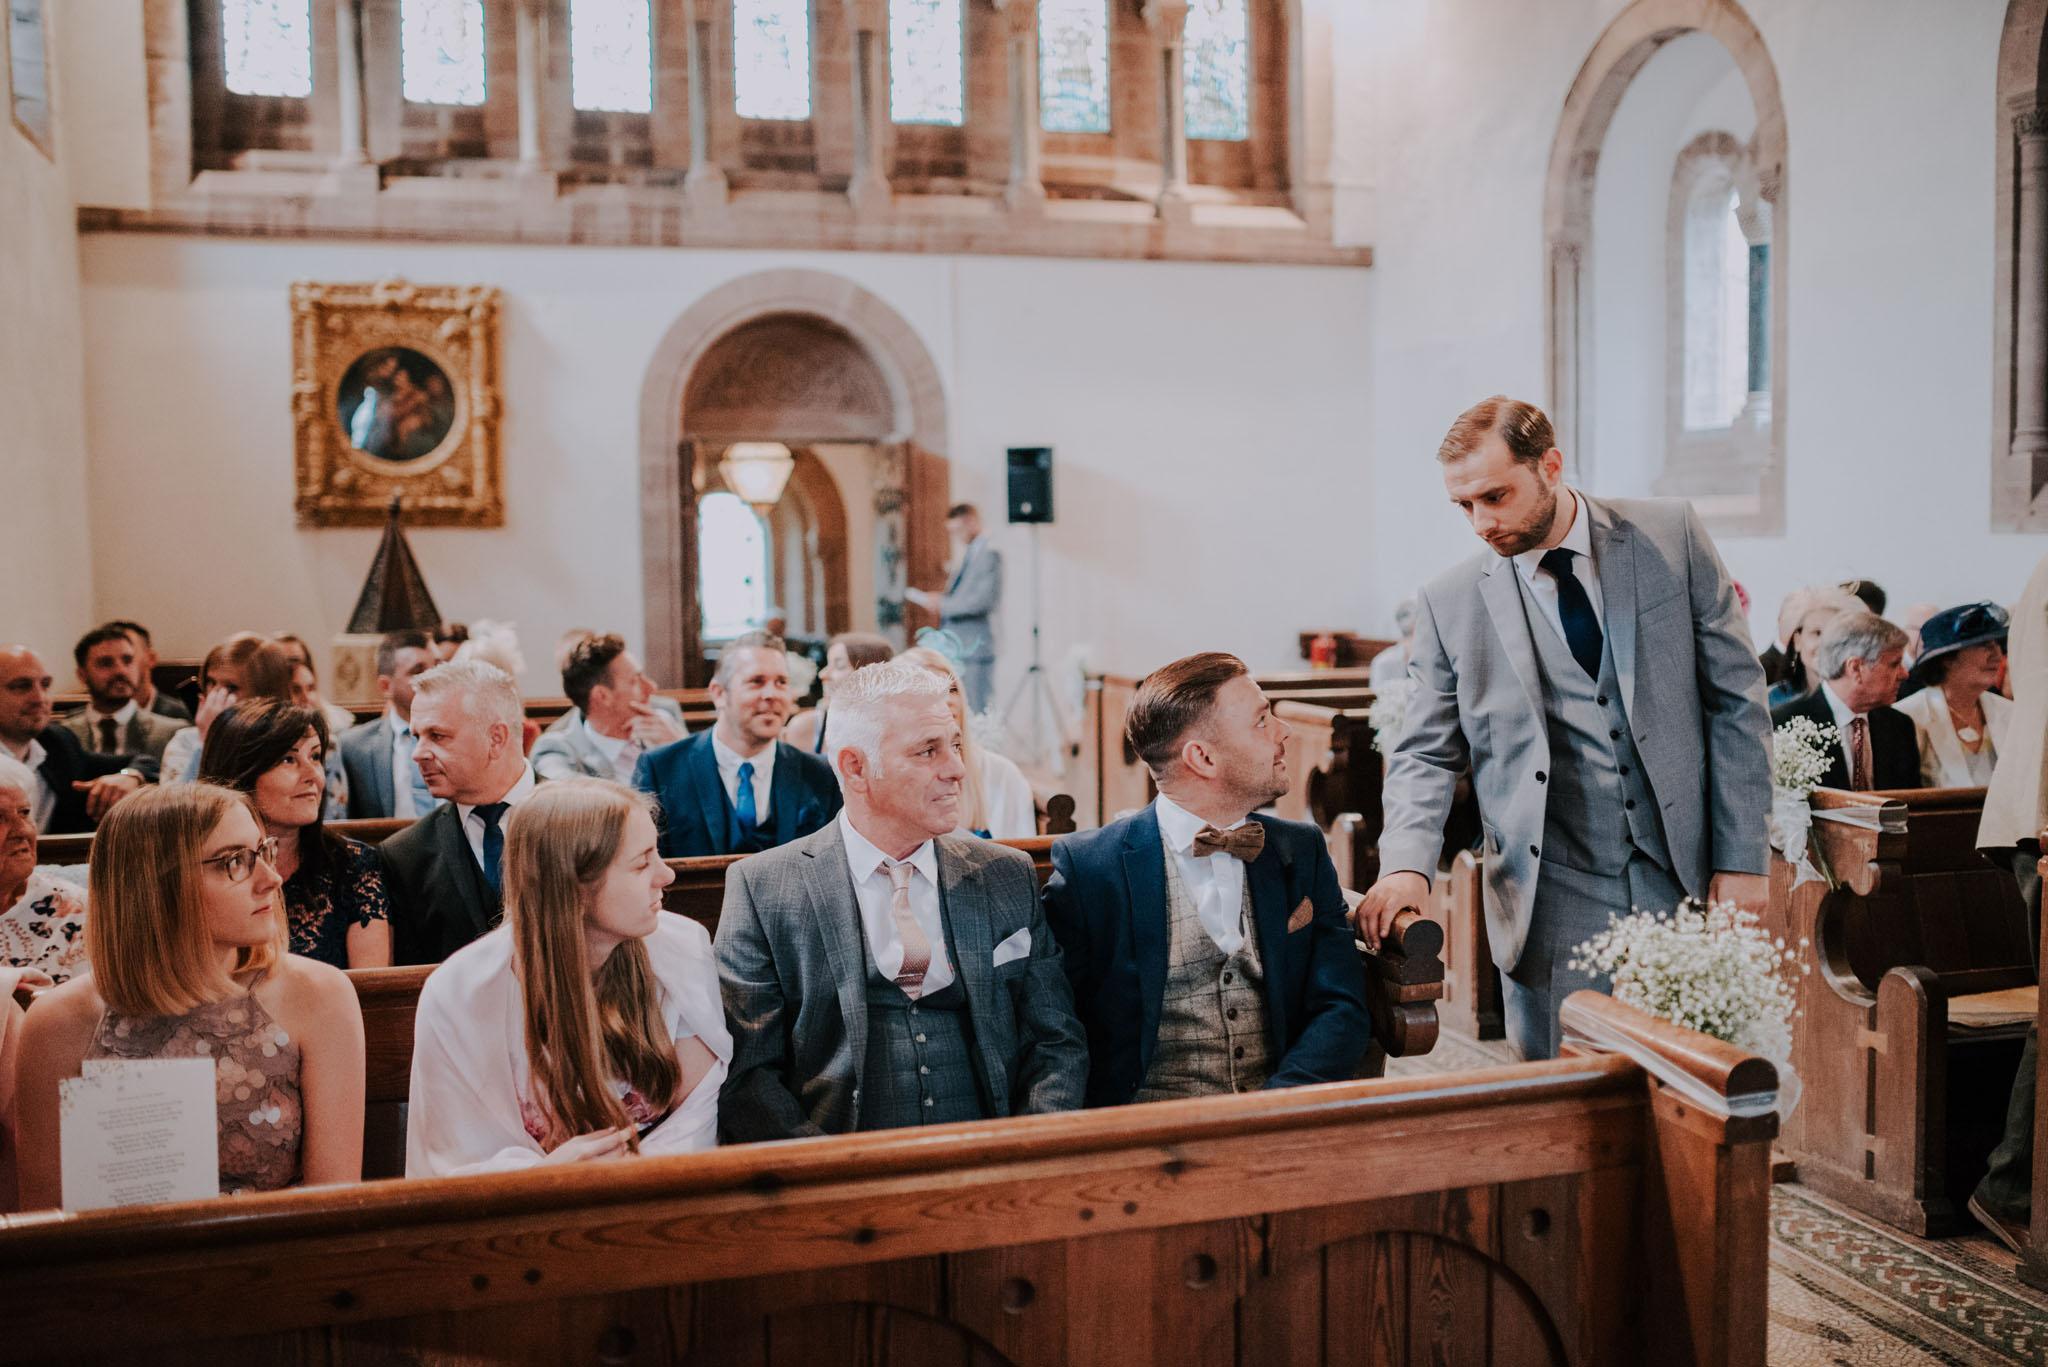 wedding-photographer-glewstone-court-hereford-scott-stockwell-photography112.jpg